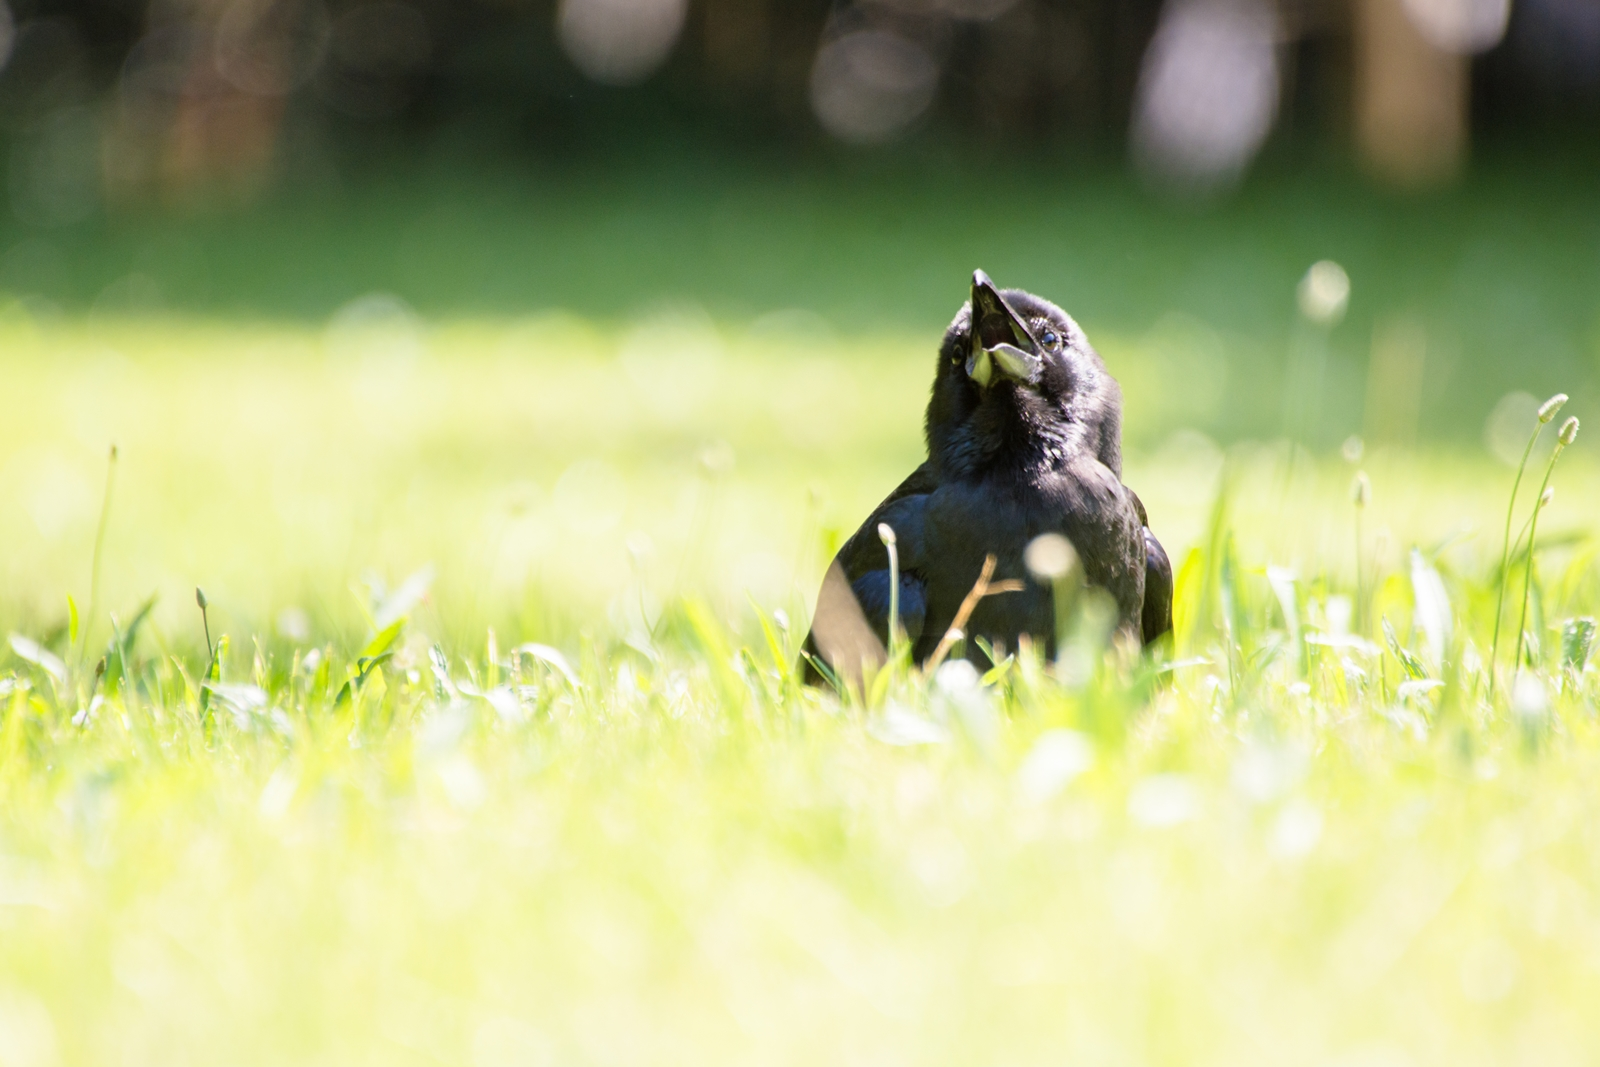 Photo: ぼ~っとする In a daze.  眩しい光 体がじんわりあたたかい まわりもふわふわ柔らかく なんだかとっても心地いい  Juvenile of Crow. (カラスの幼鳥)  #birdphotography #birds #cooljapan #kawaii #nikon #sigma Nikon D7200 SIGMA APO 50-500mm F5-6.3 DG OS HSM  ・小鳥の詩朗読 /poetry reading https://youtu.be/SDQMUYDs5_s?list=PL2YtHGm0-R3qVsaqvQe9OYdJFCkI98wzF